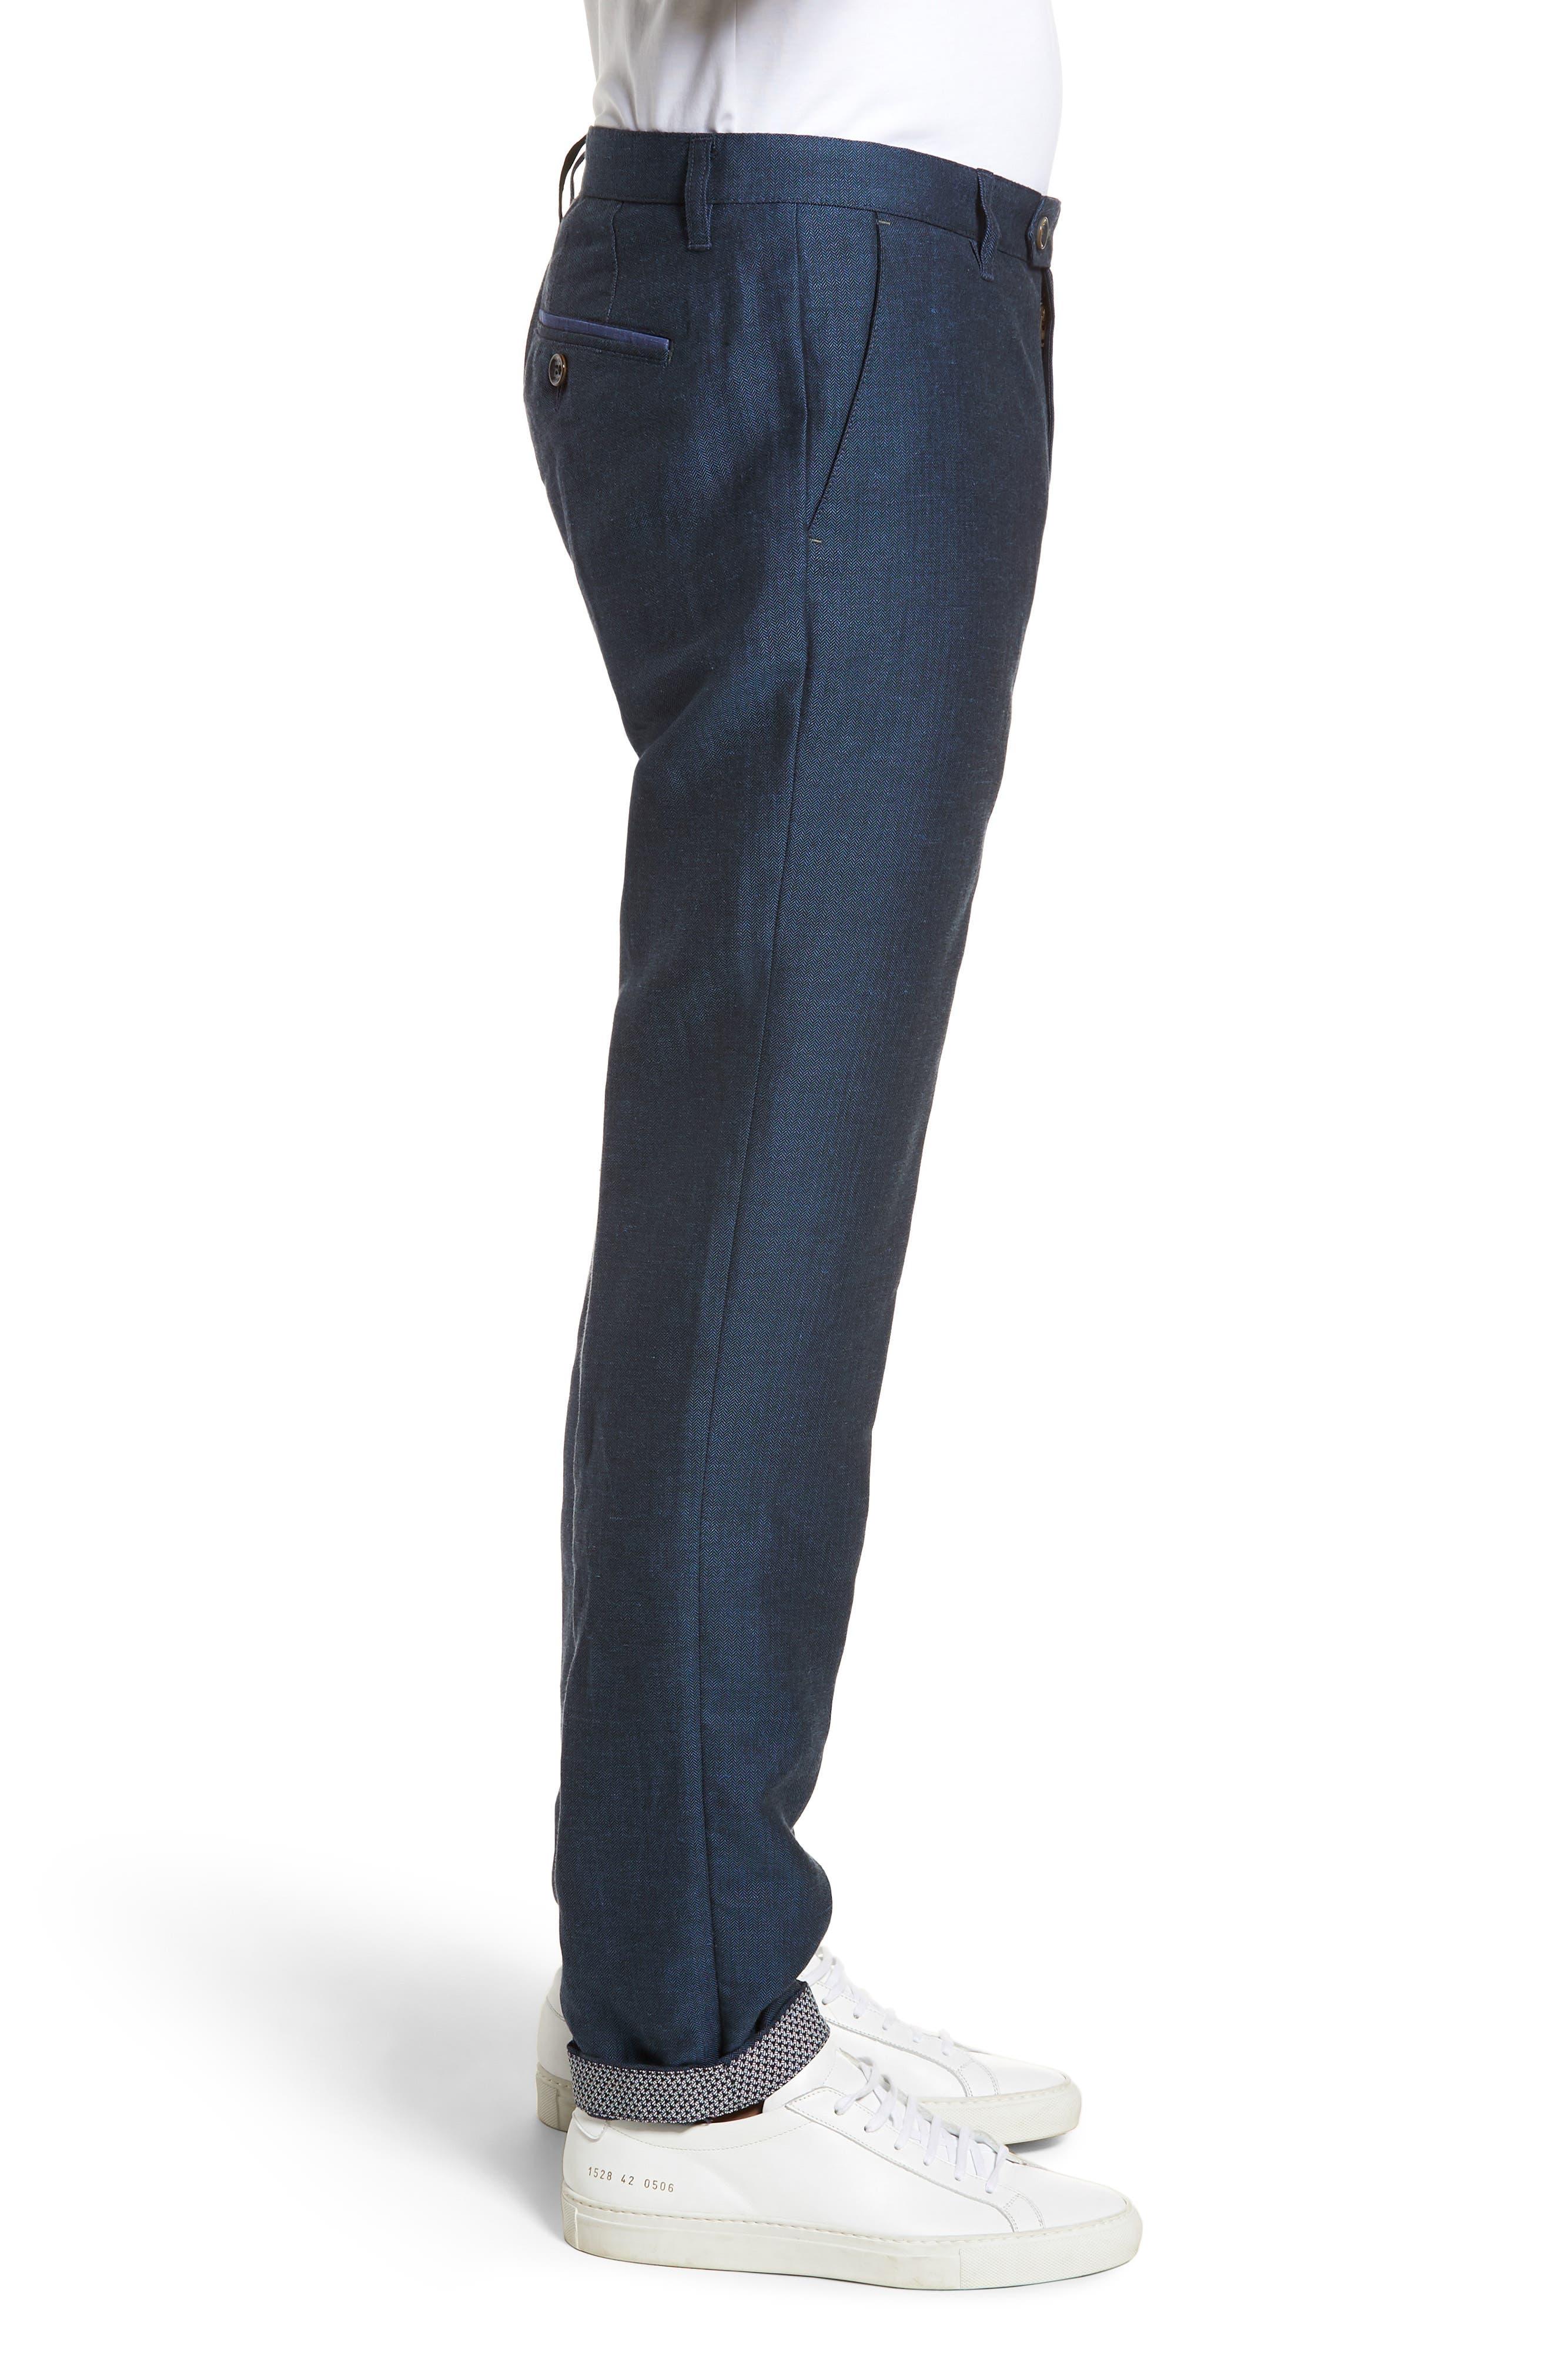 Cazzman Flat Front Stretch Pants,                             Alternate thumbnail 3, color,                             Navy